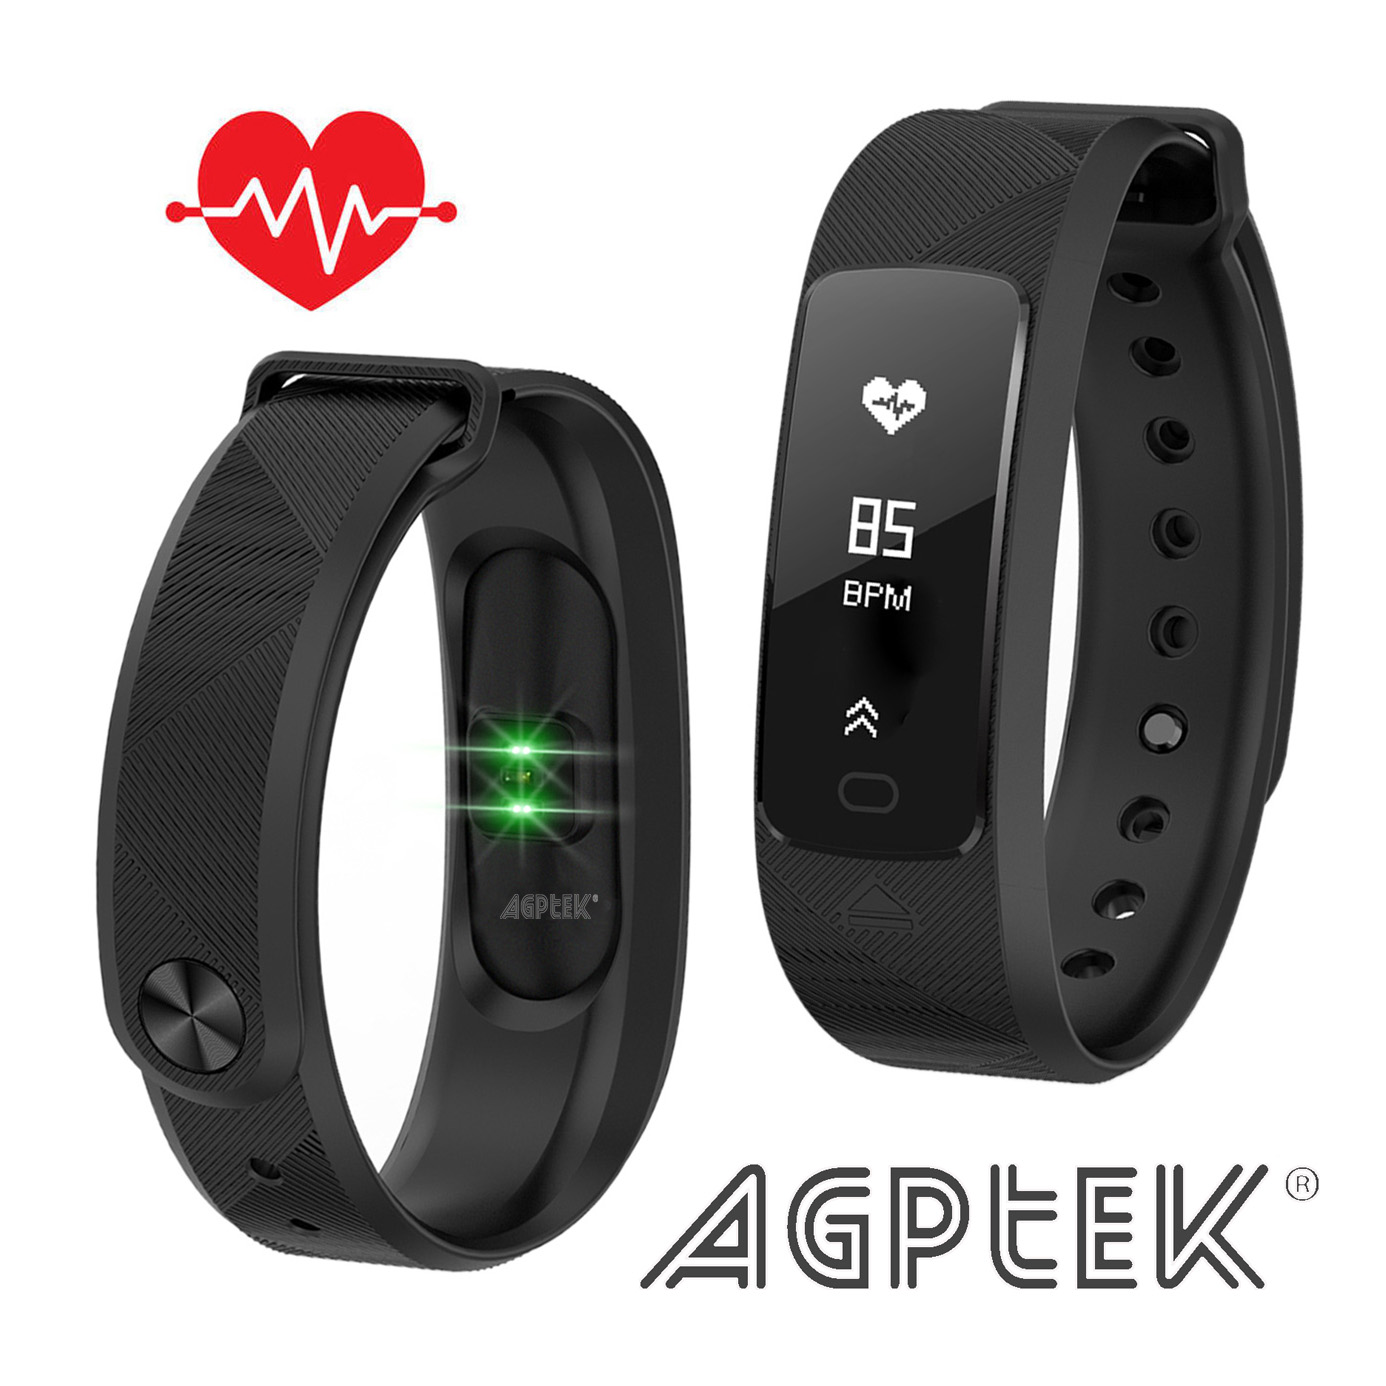 AGPtek Fitness Tracker Smart Wristband with Blood Pressure Heart Rate Monitor IP68 Waterproof Pedometer Sleep Monitor